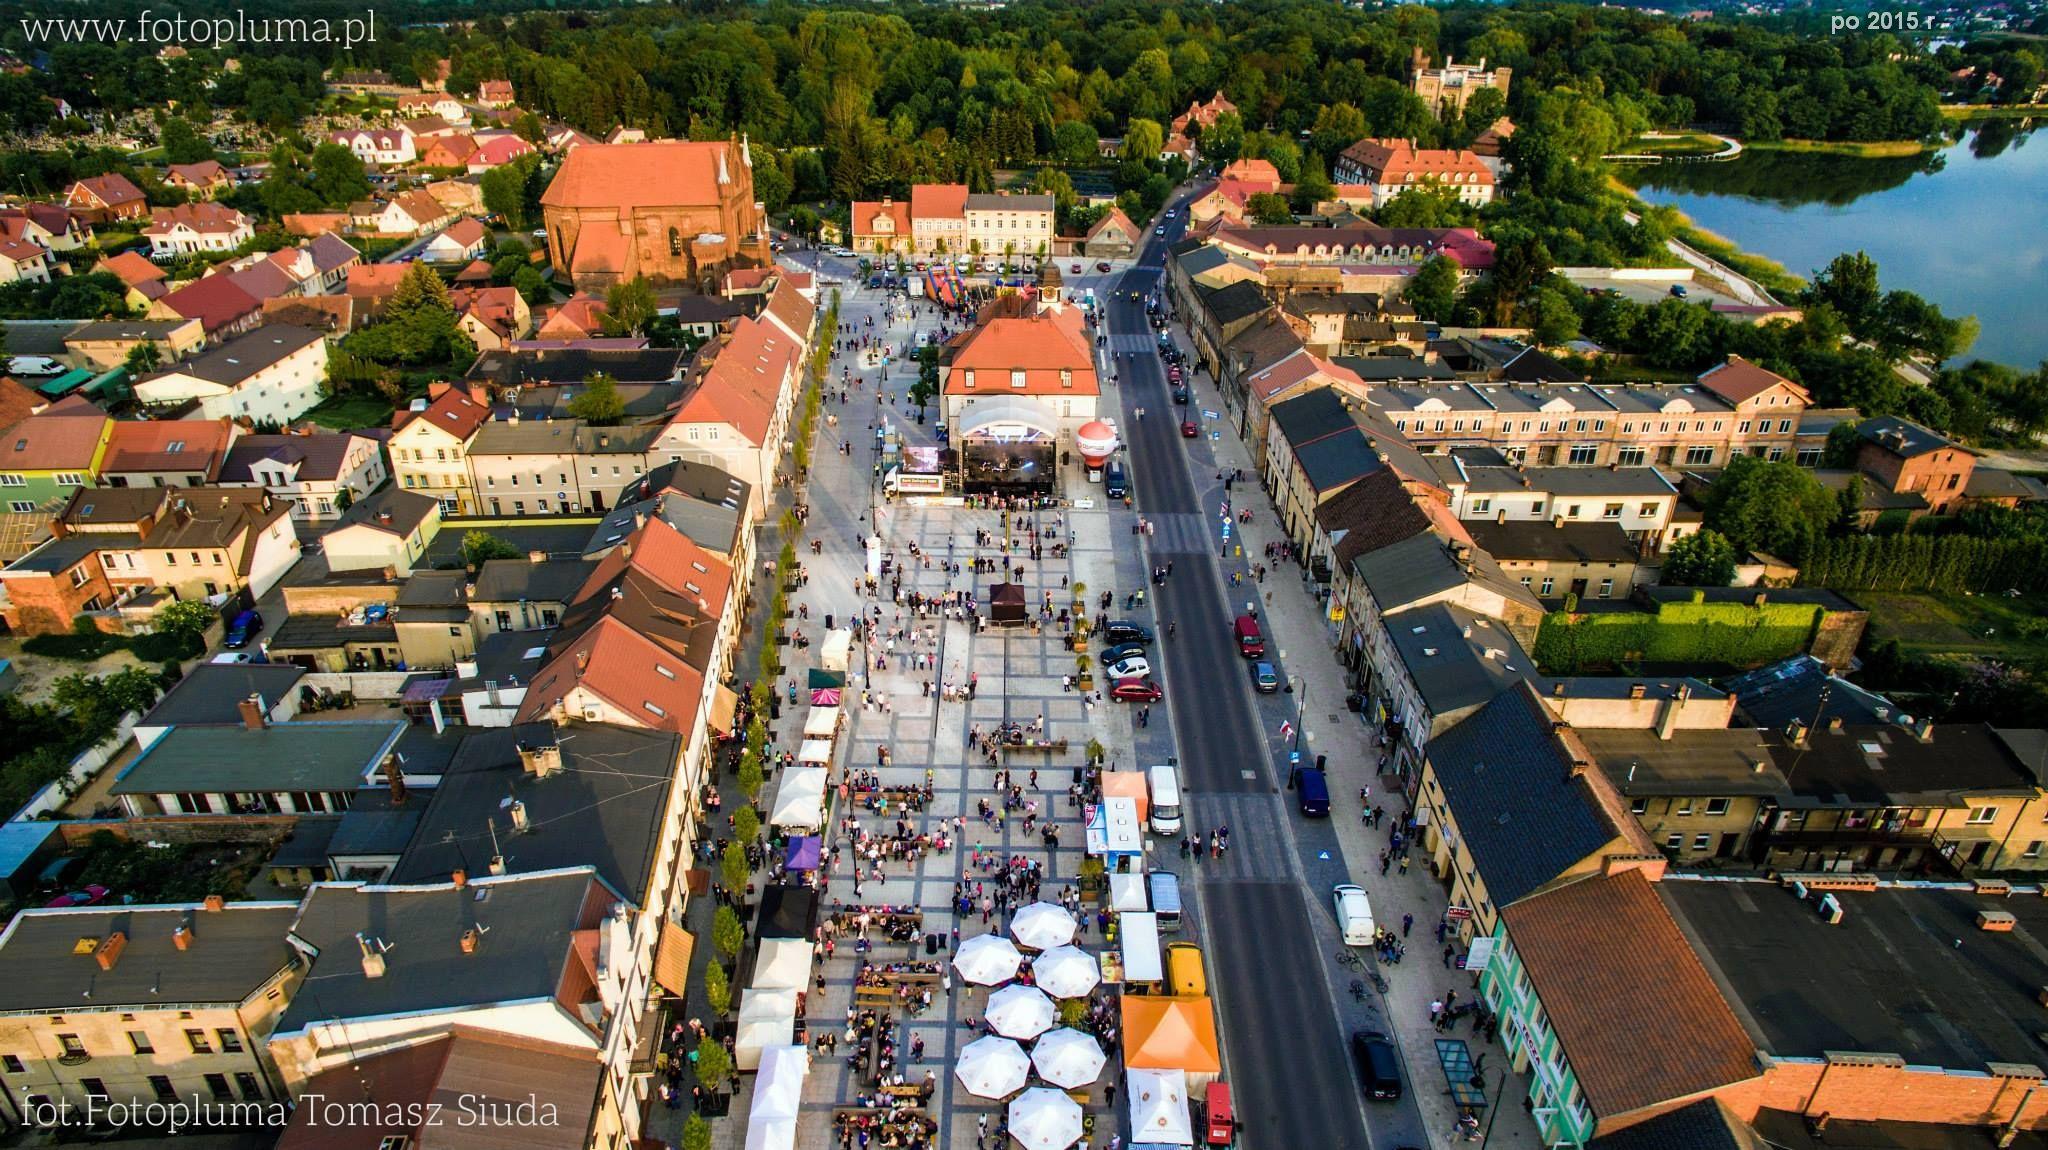 panorama-kornika-2015-fotopluma-3